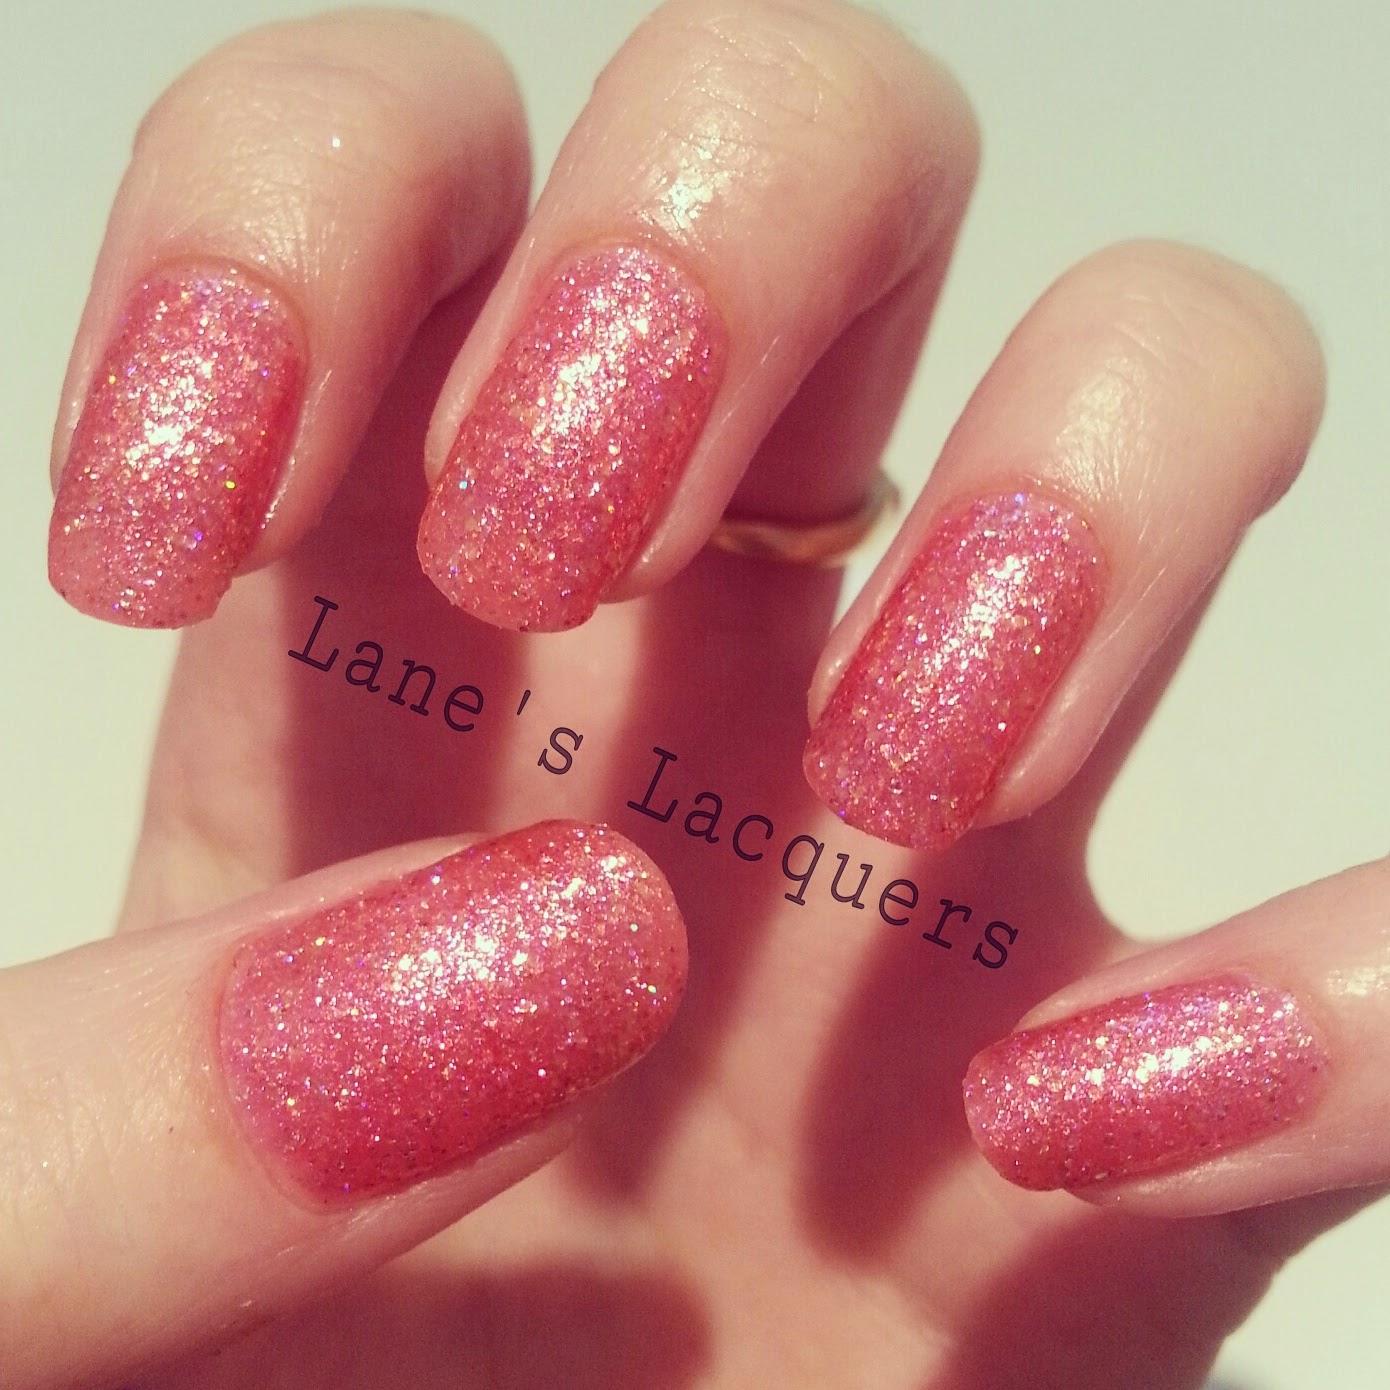 new-barry-m-glitterati-starlet-swatch-manicure